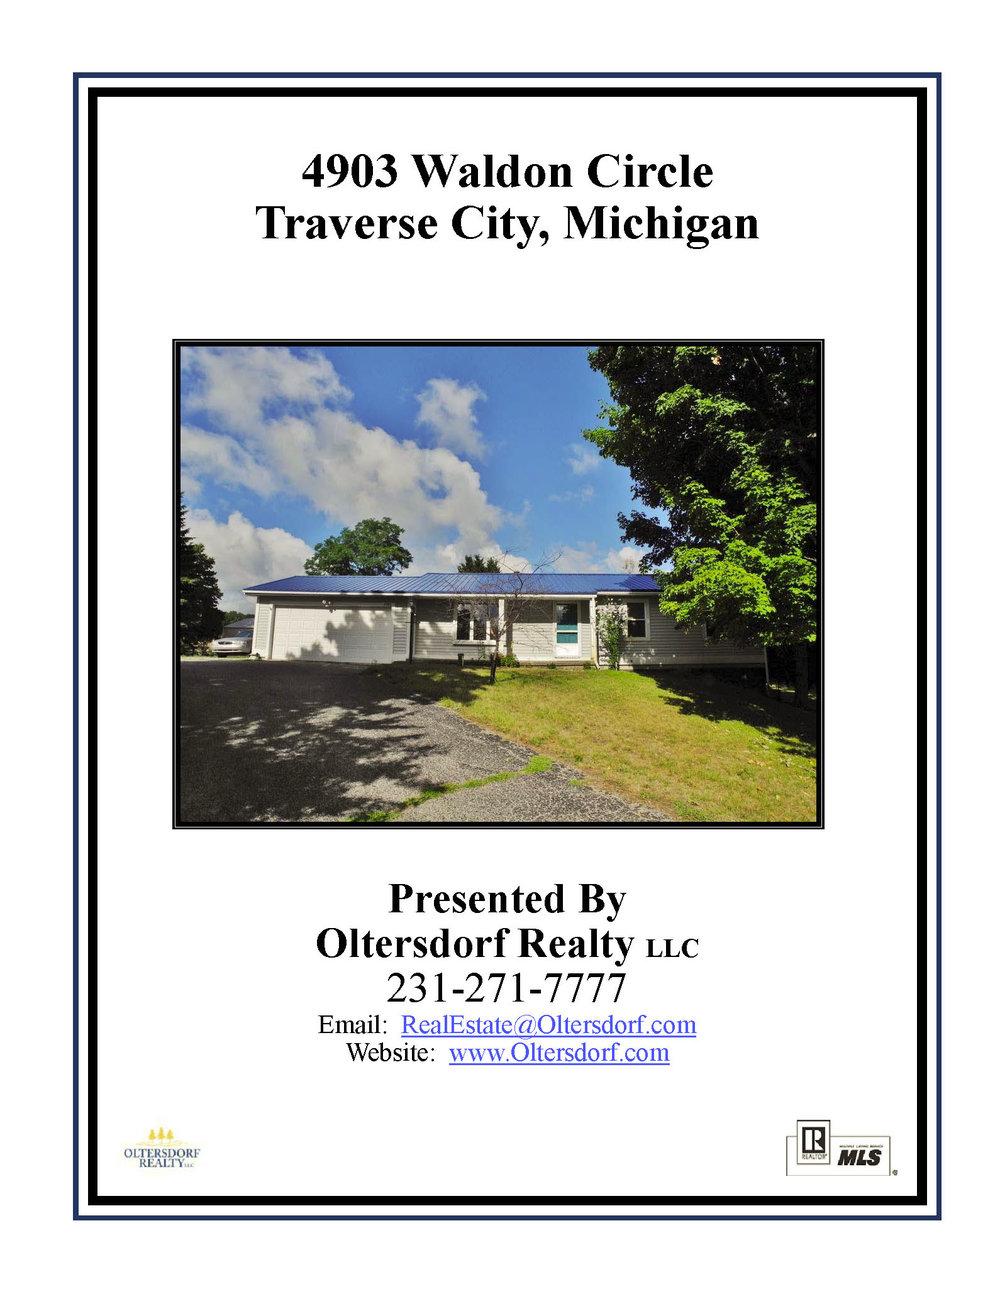 4903 Waldon Circle, Traverse City, MI – 3 Bedroom & 2 Bath Ranch Home for sale by Oltersdorf Realty LLC marketing packet (1).jpg